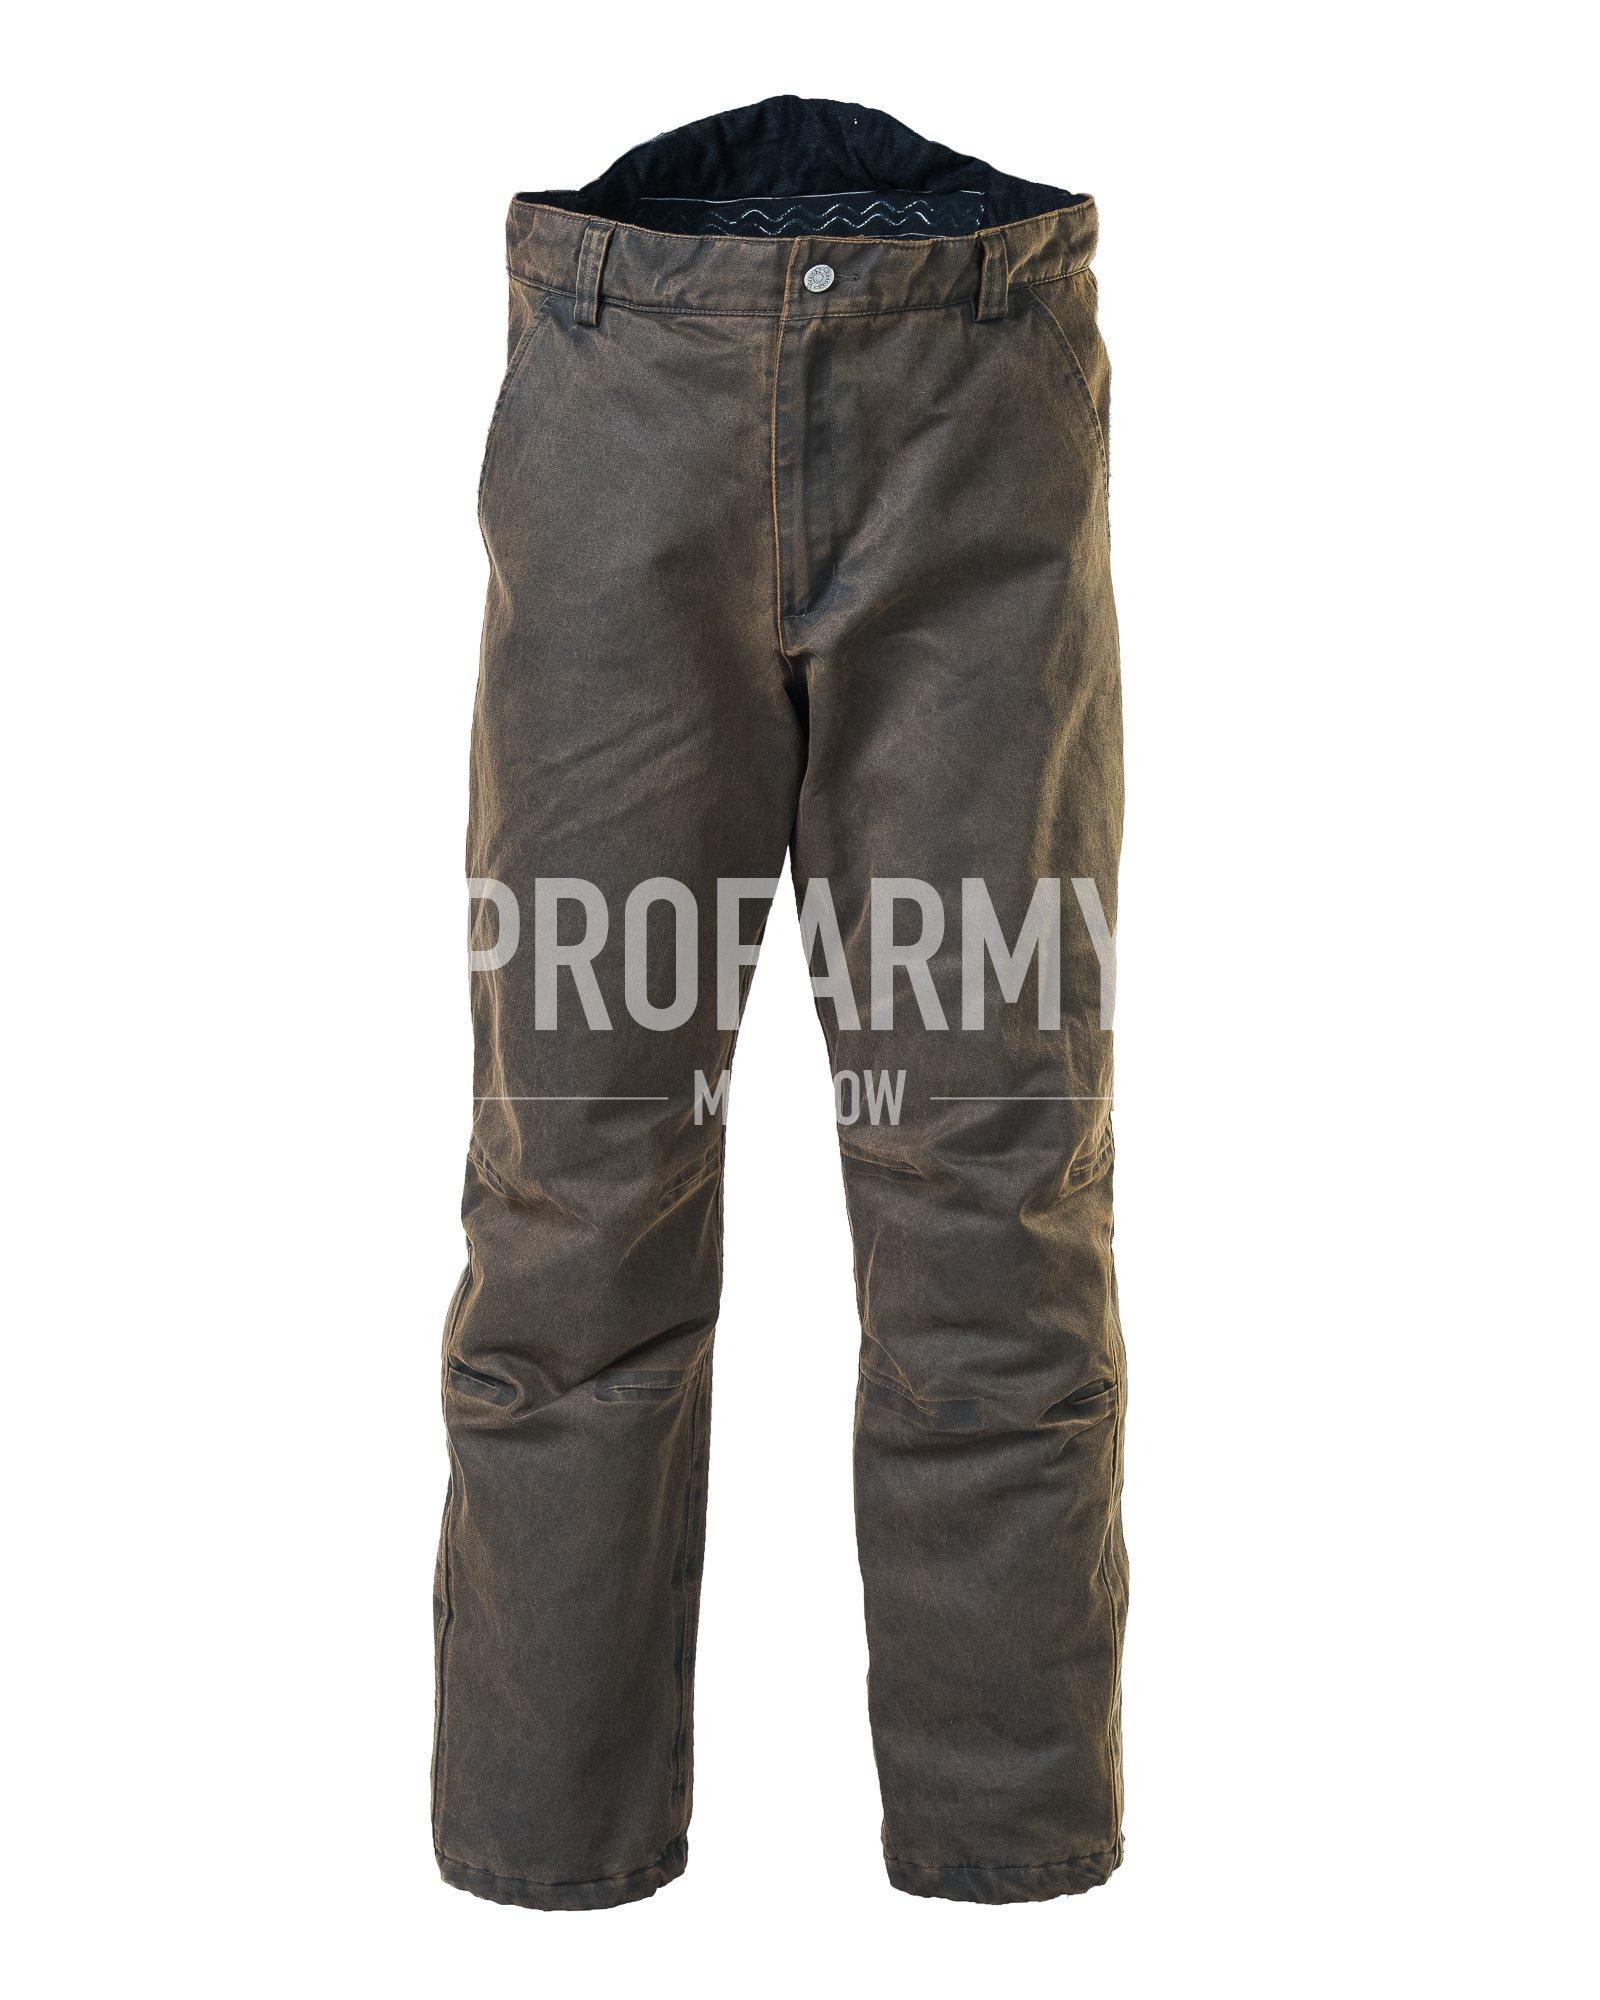 Брюки Foxbib, Тактические брюки - арт. 897920344